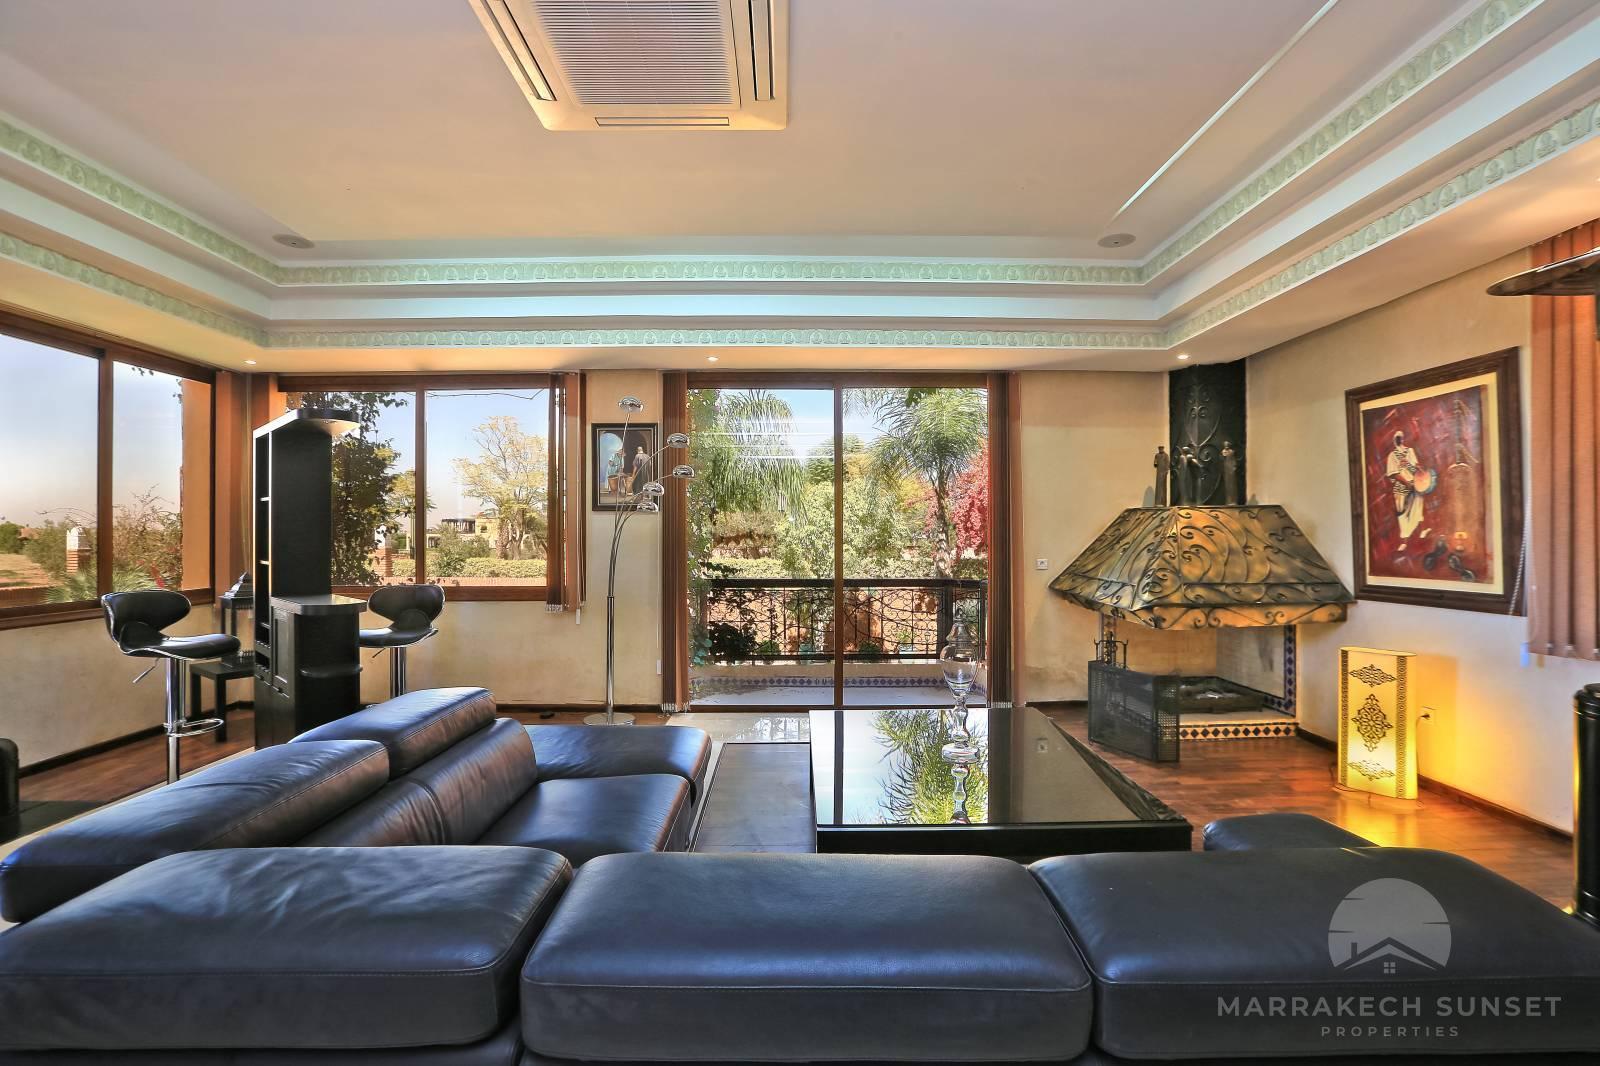 8 bedroom villa for sale Marrakech Amelkis golf club